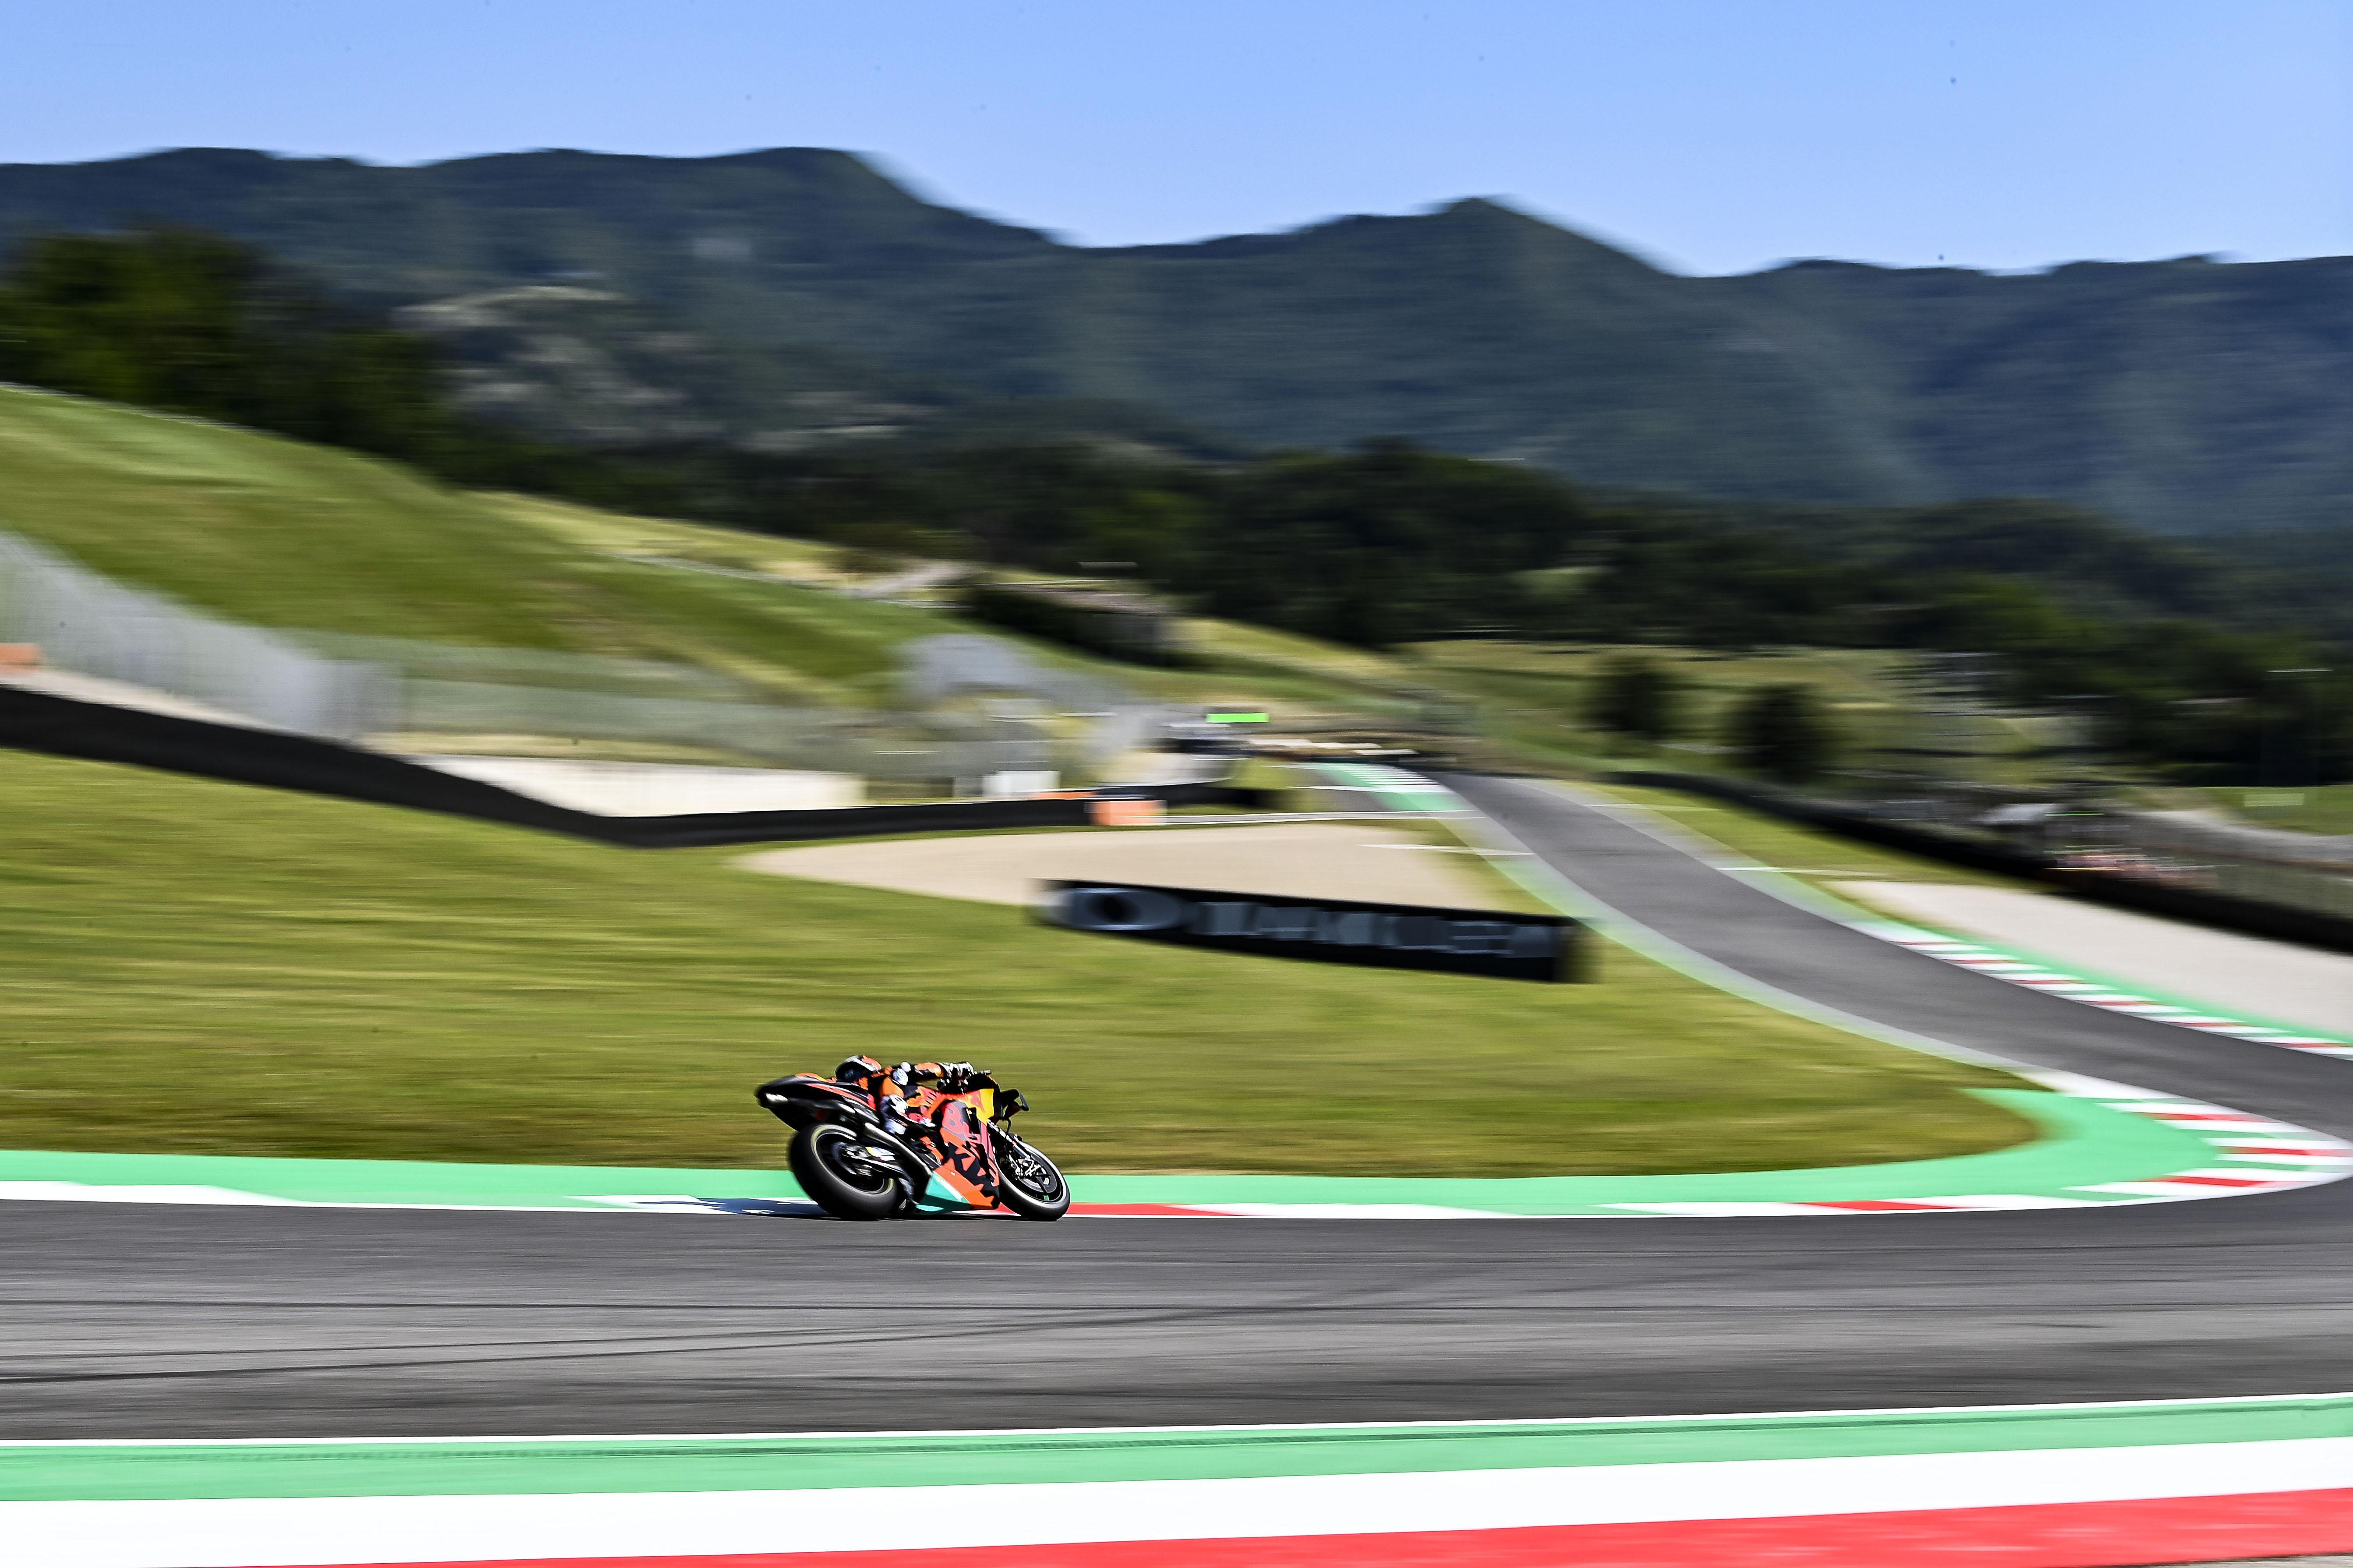 Miguel Oliveira KTM Mugello MotoGP 2021